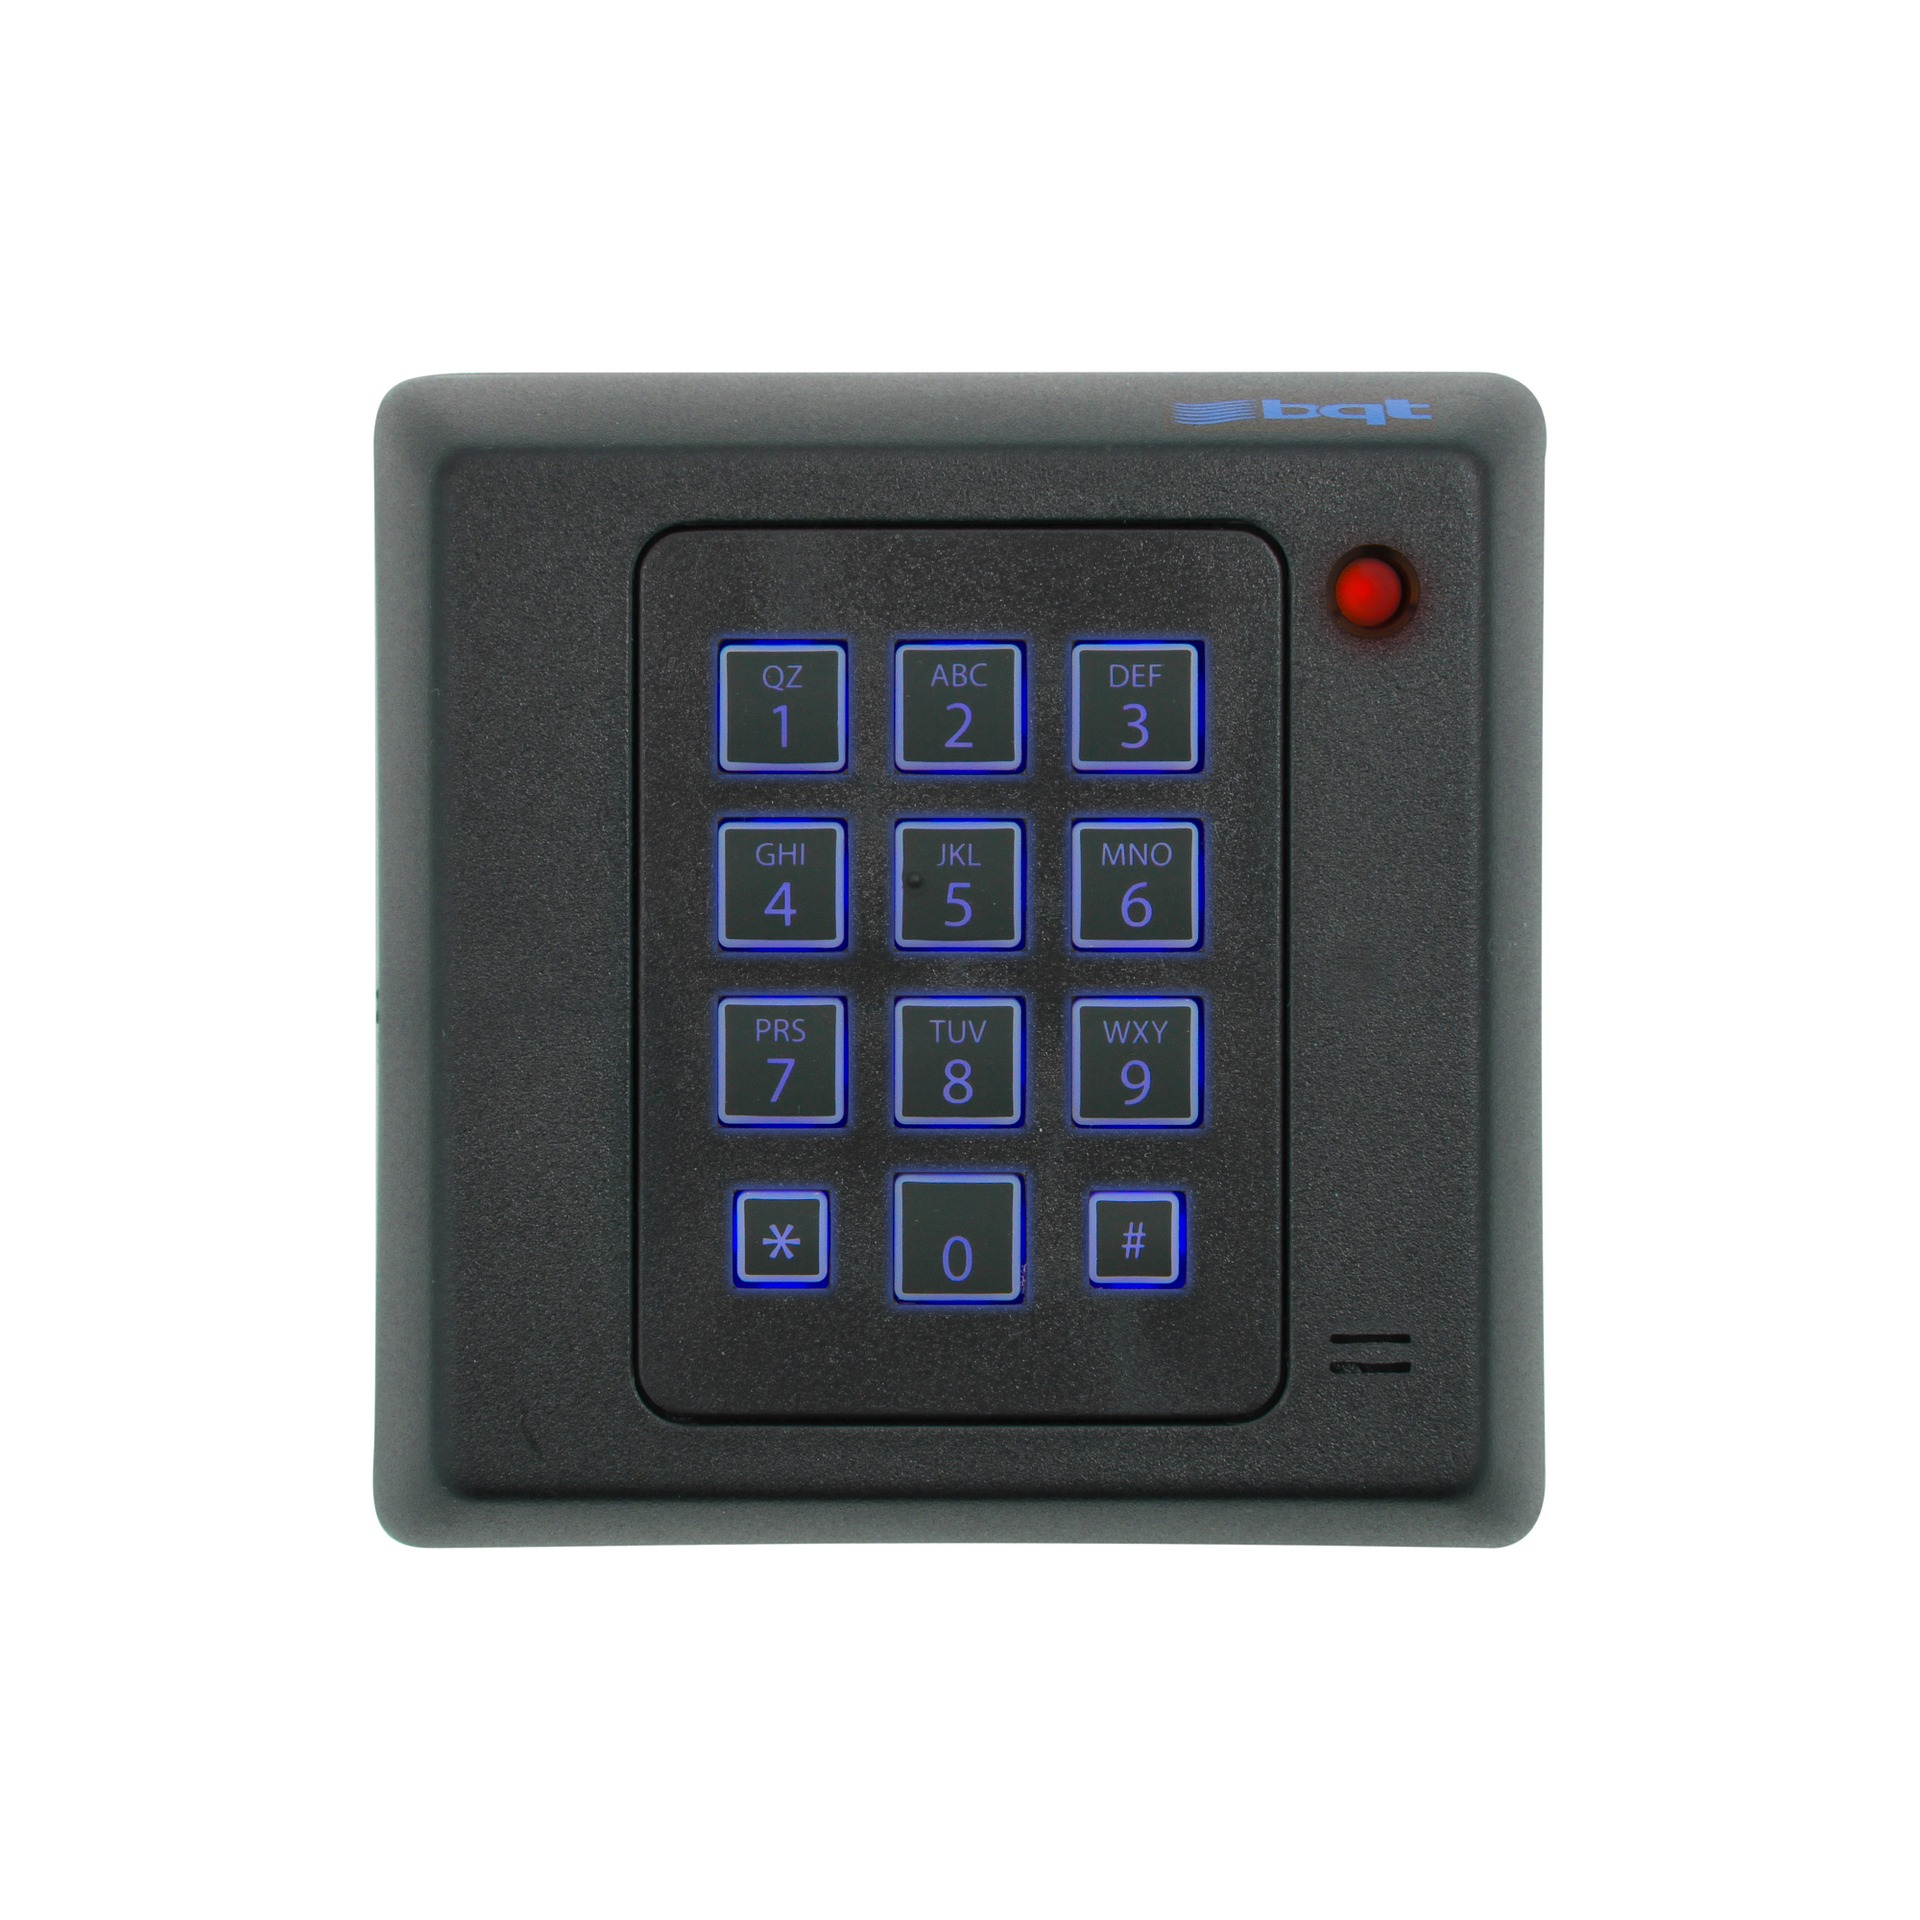 pin-reader-1006677_1920